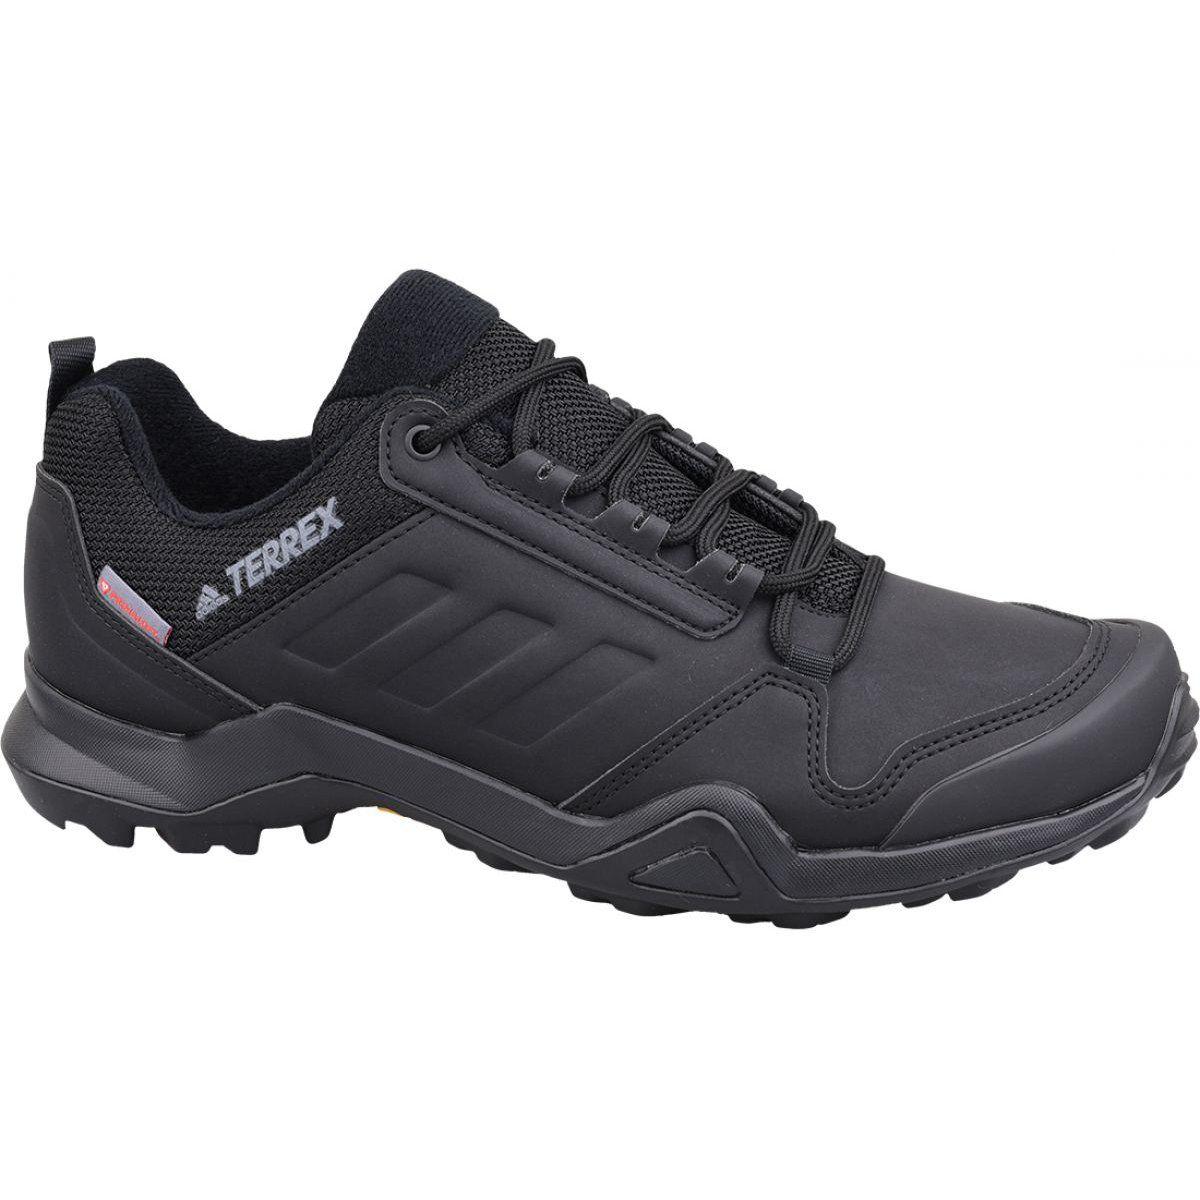 Buty Adidas Terrex Ax3 Beta M G26523 Czarne Black Shoes Men Sports Shoes Adidas Adidas